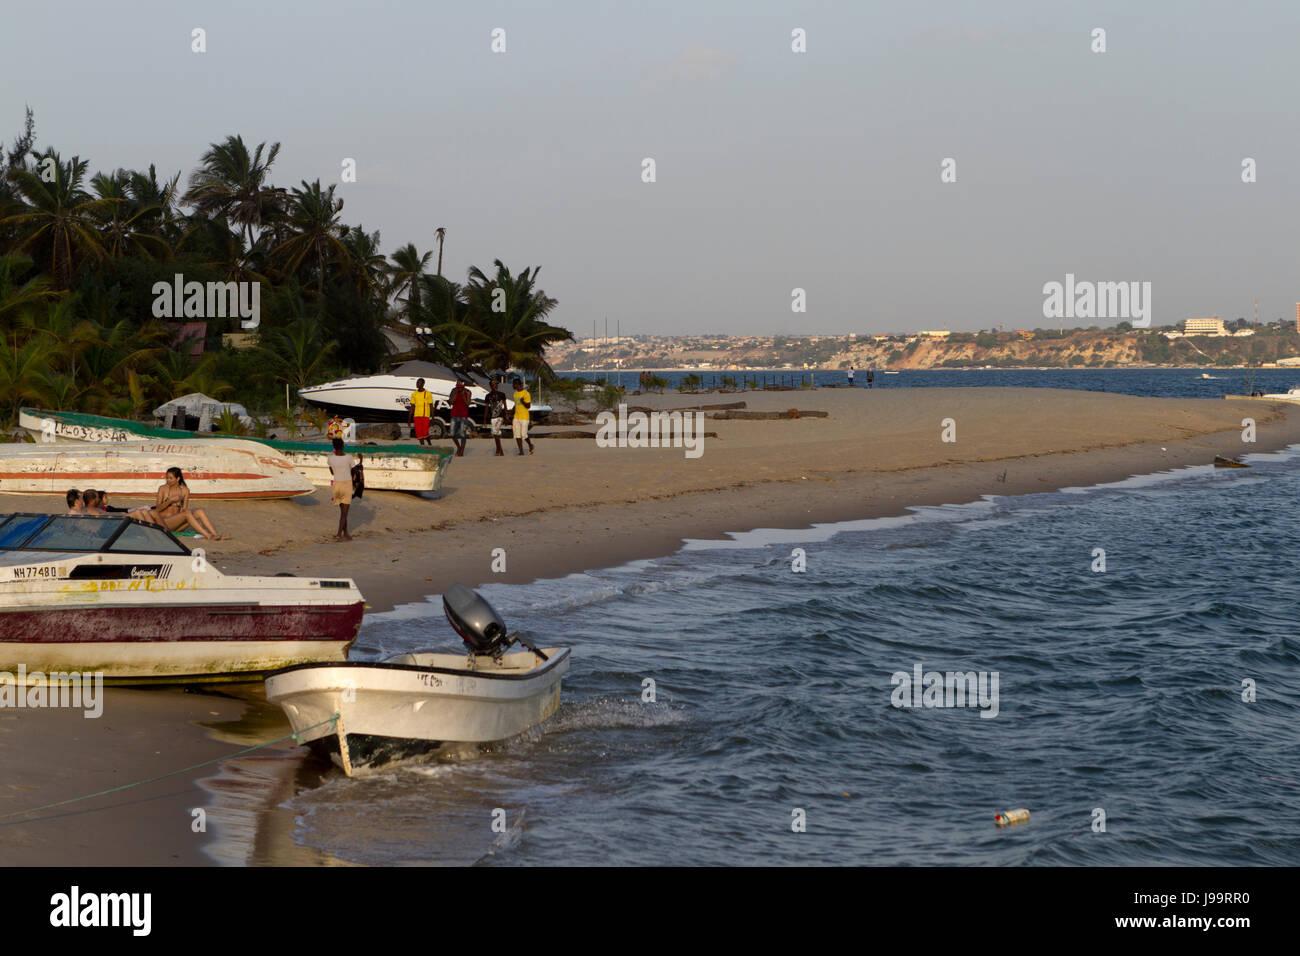 Boats in Mussulo island, Luanda Angola - Stock Image